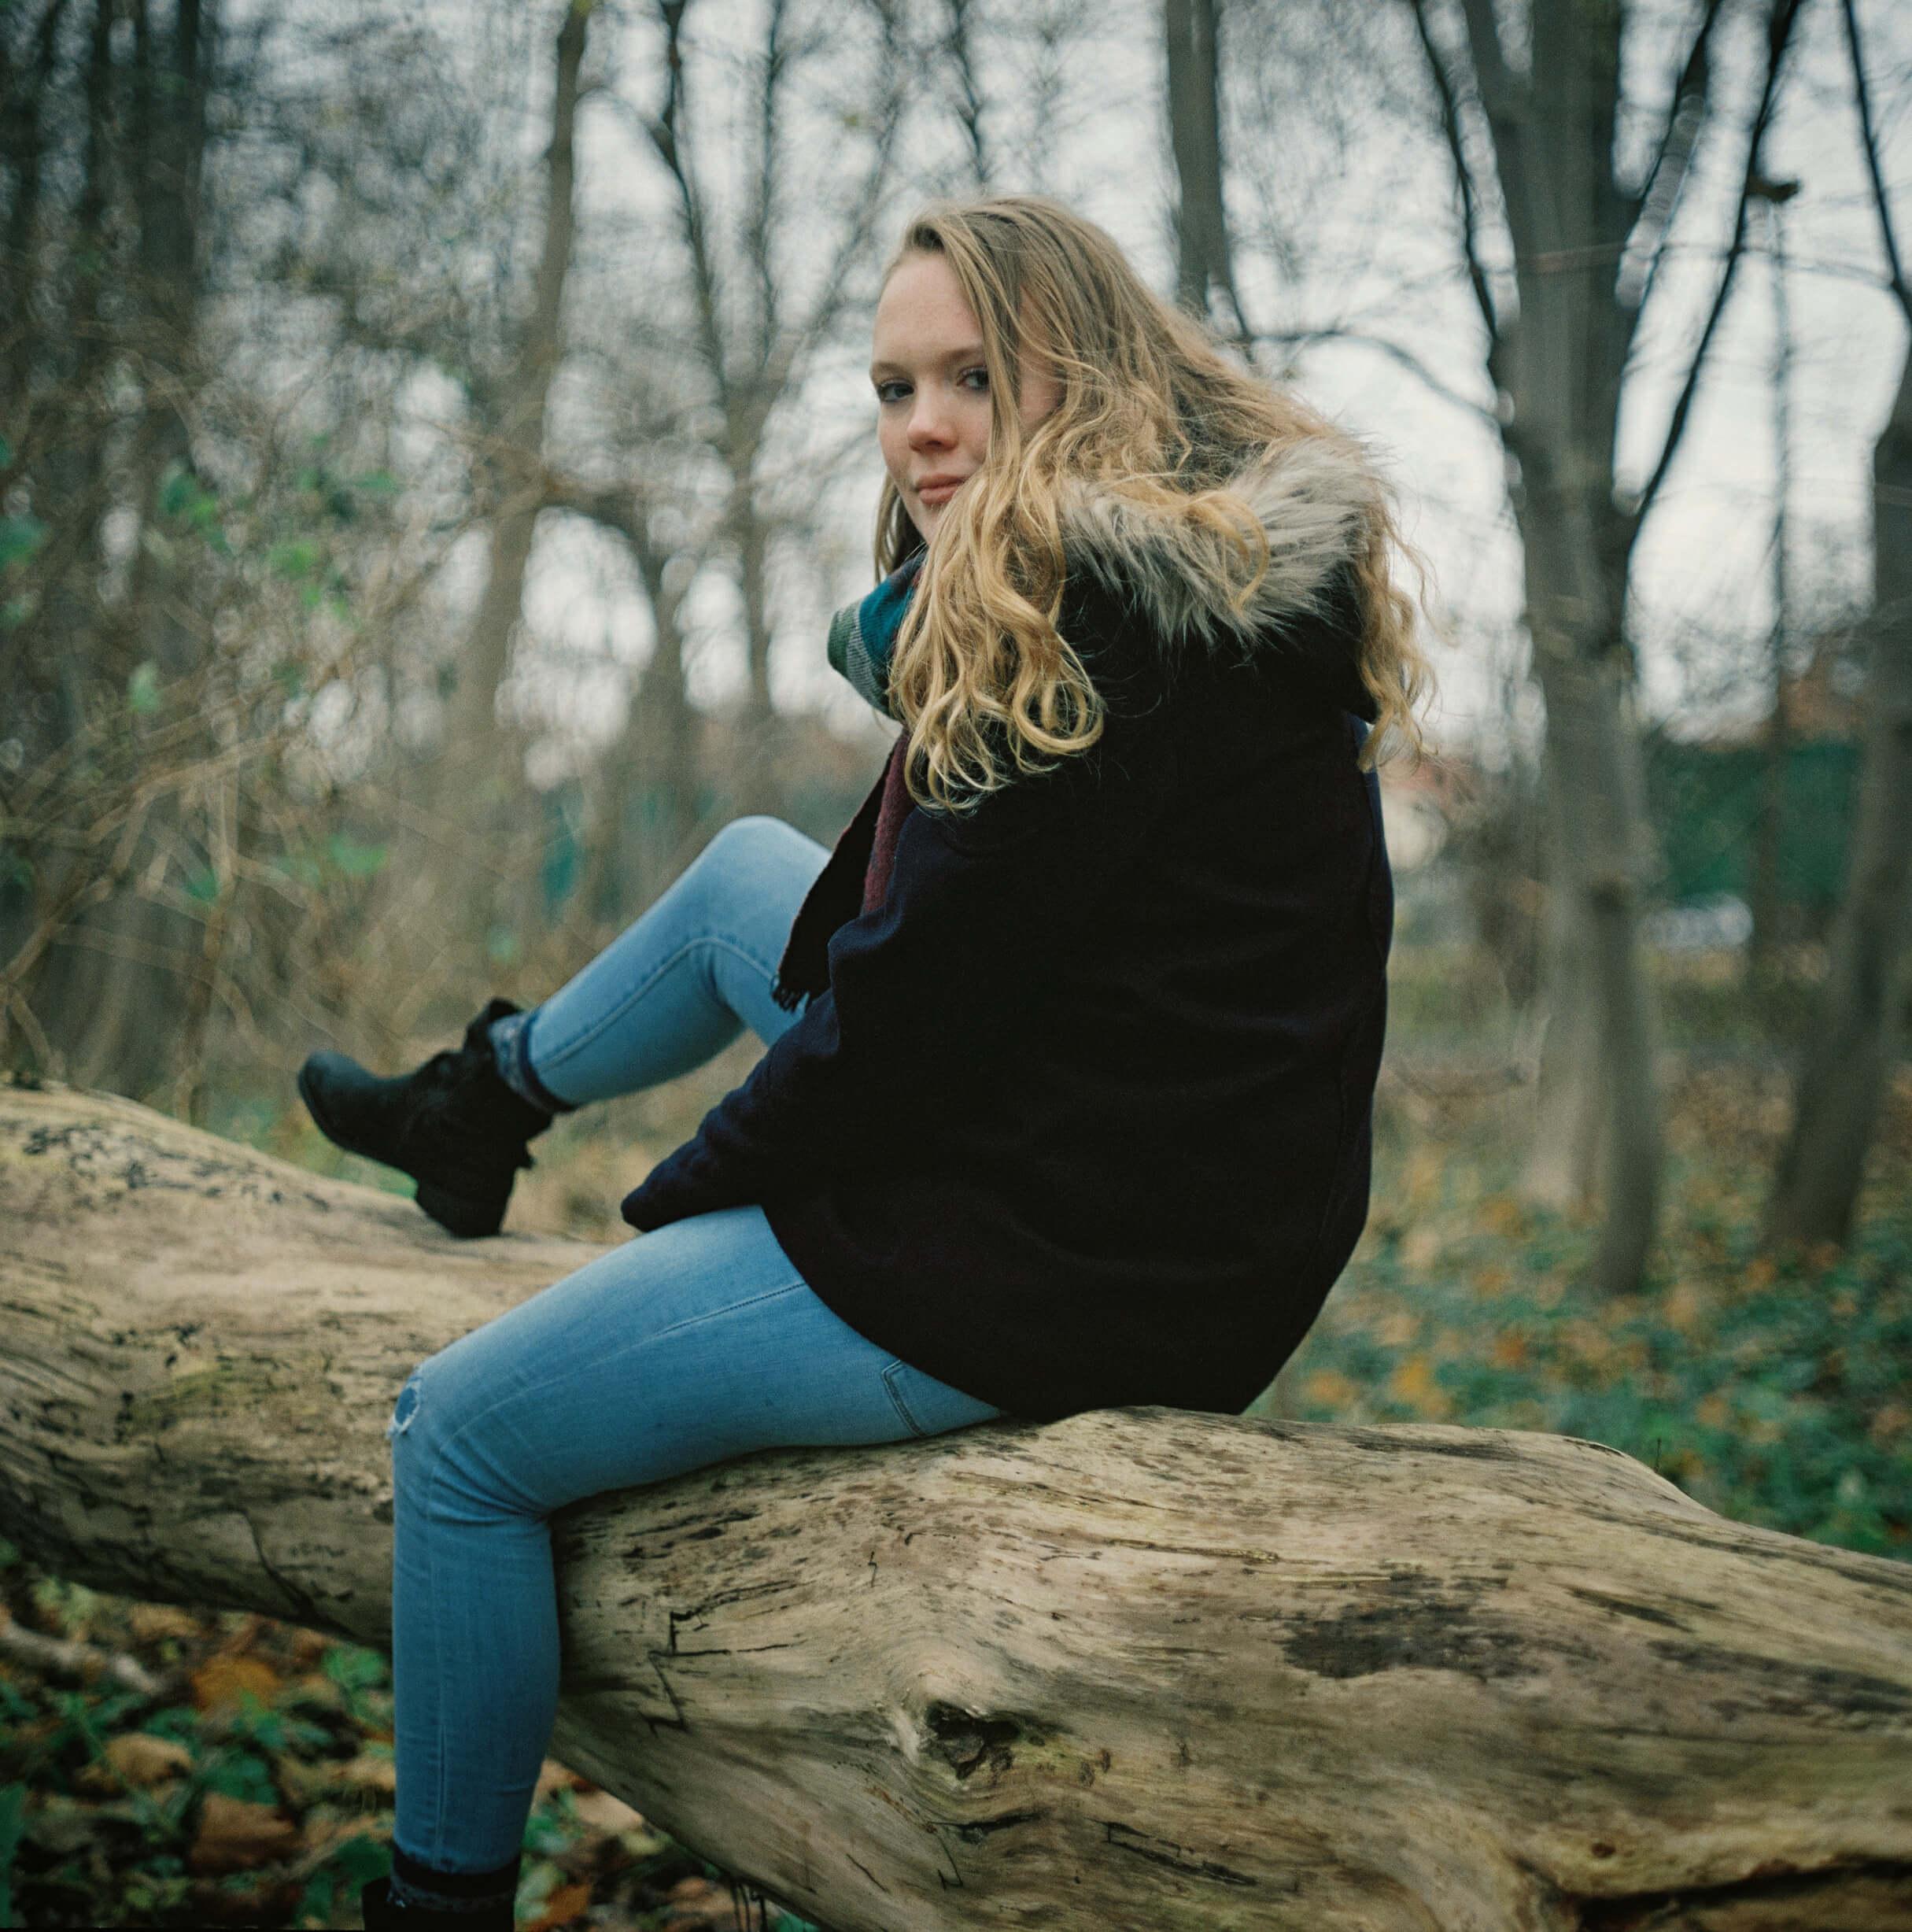 Kalenner Deern November Josephine Nevelmaand (c) Lomoherz